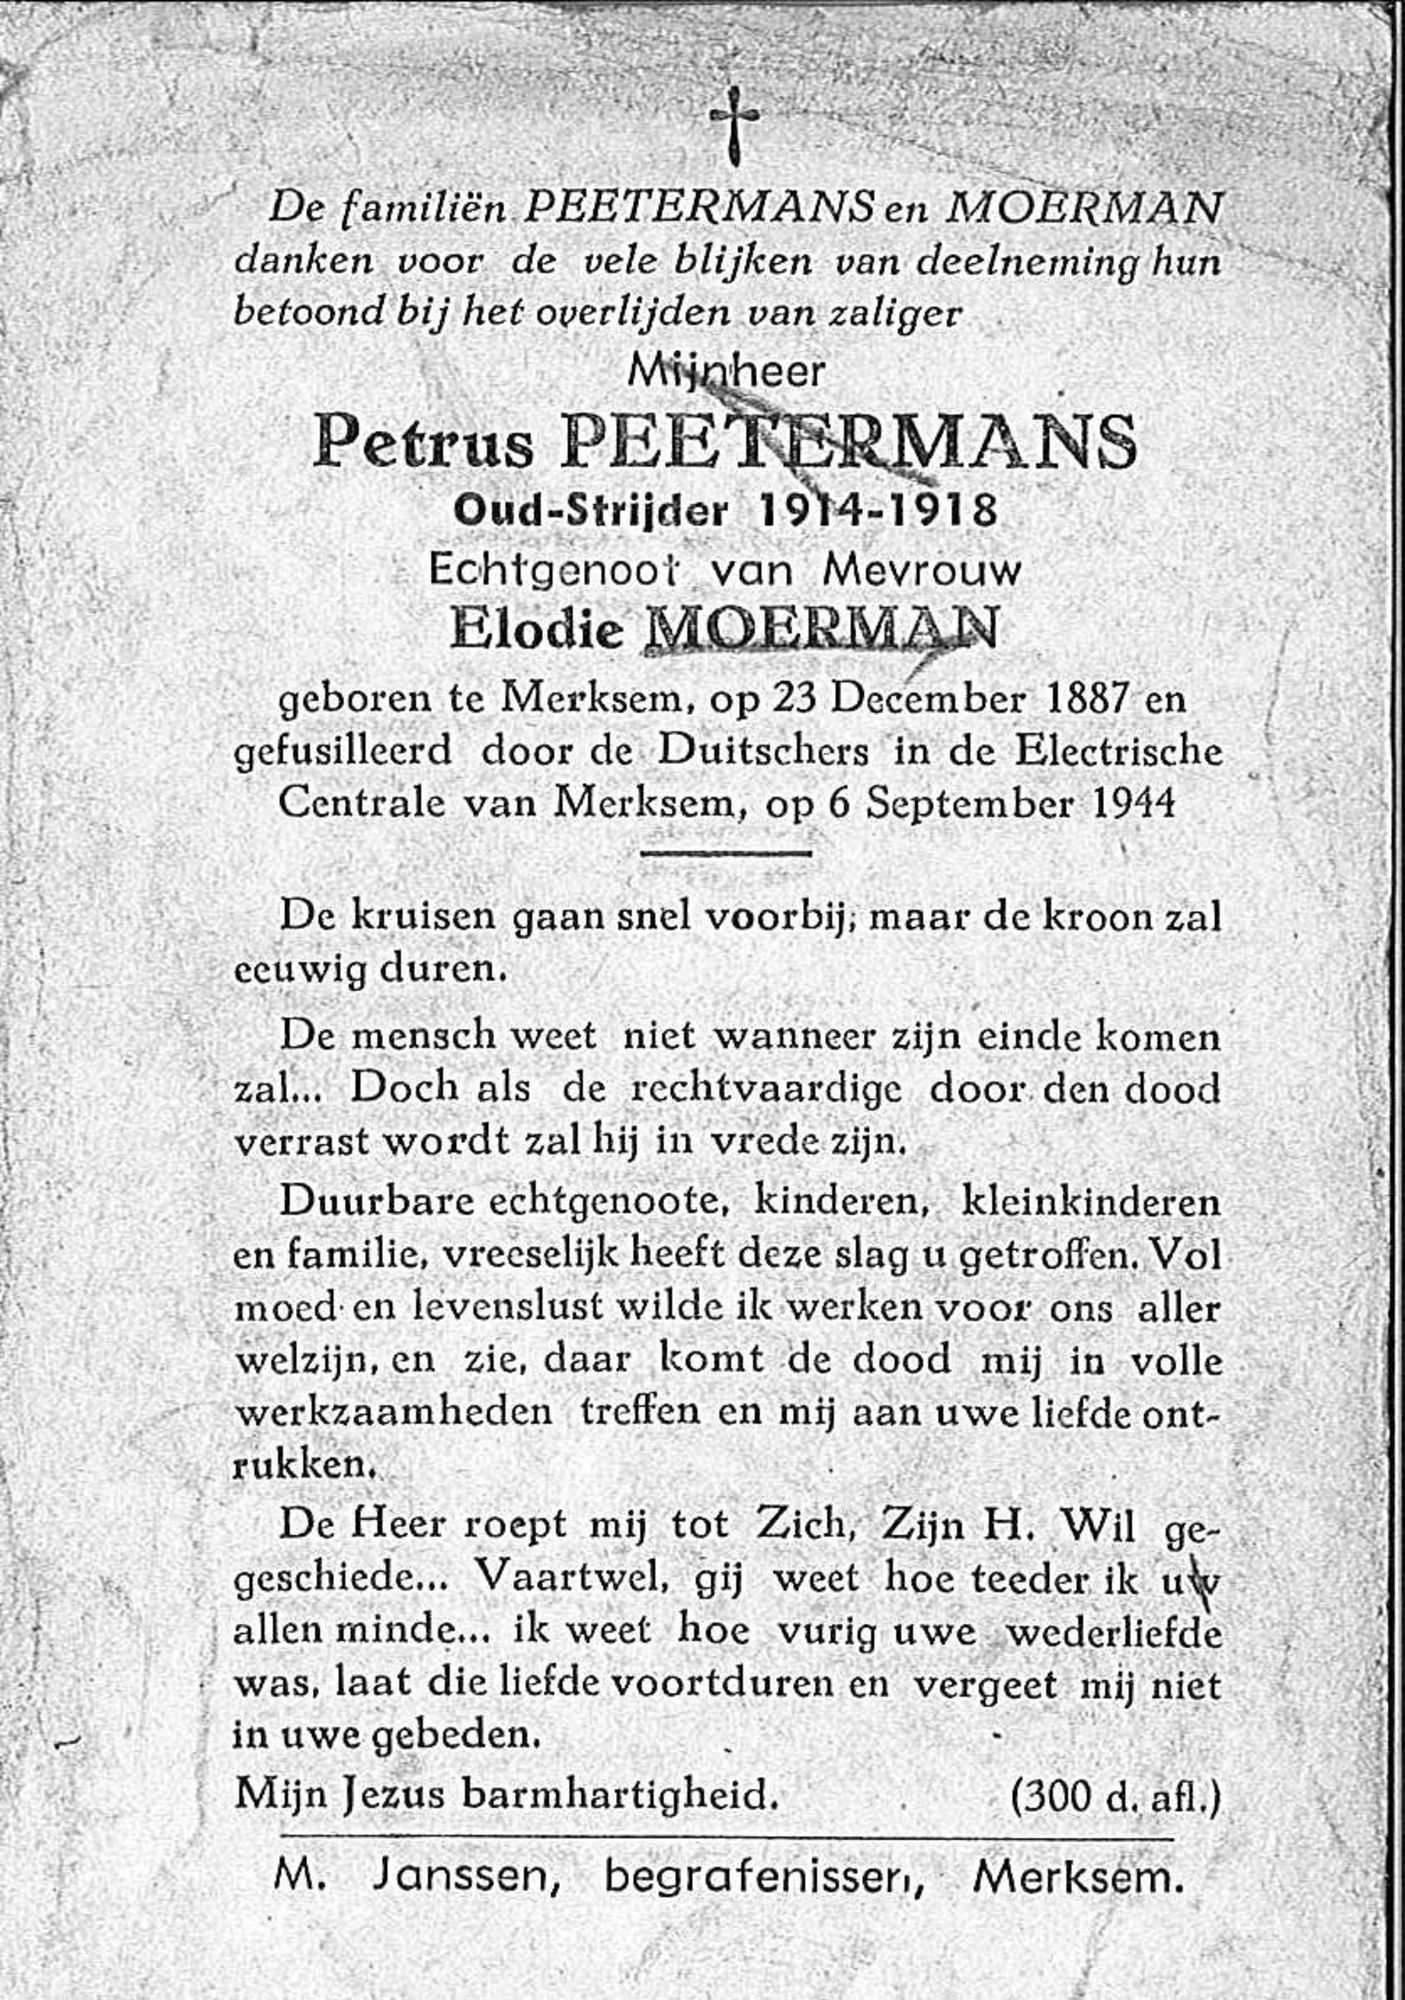 Petrus Peetermans